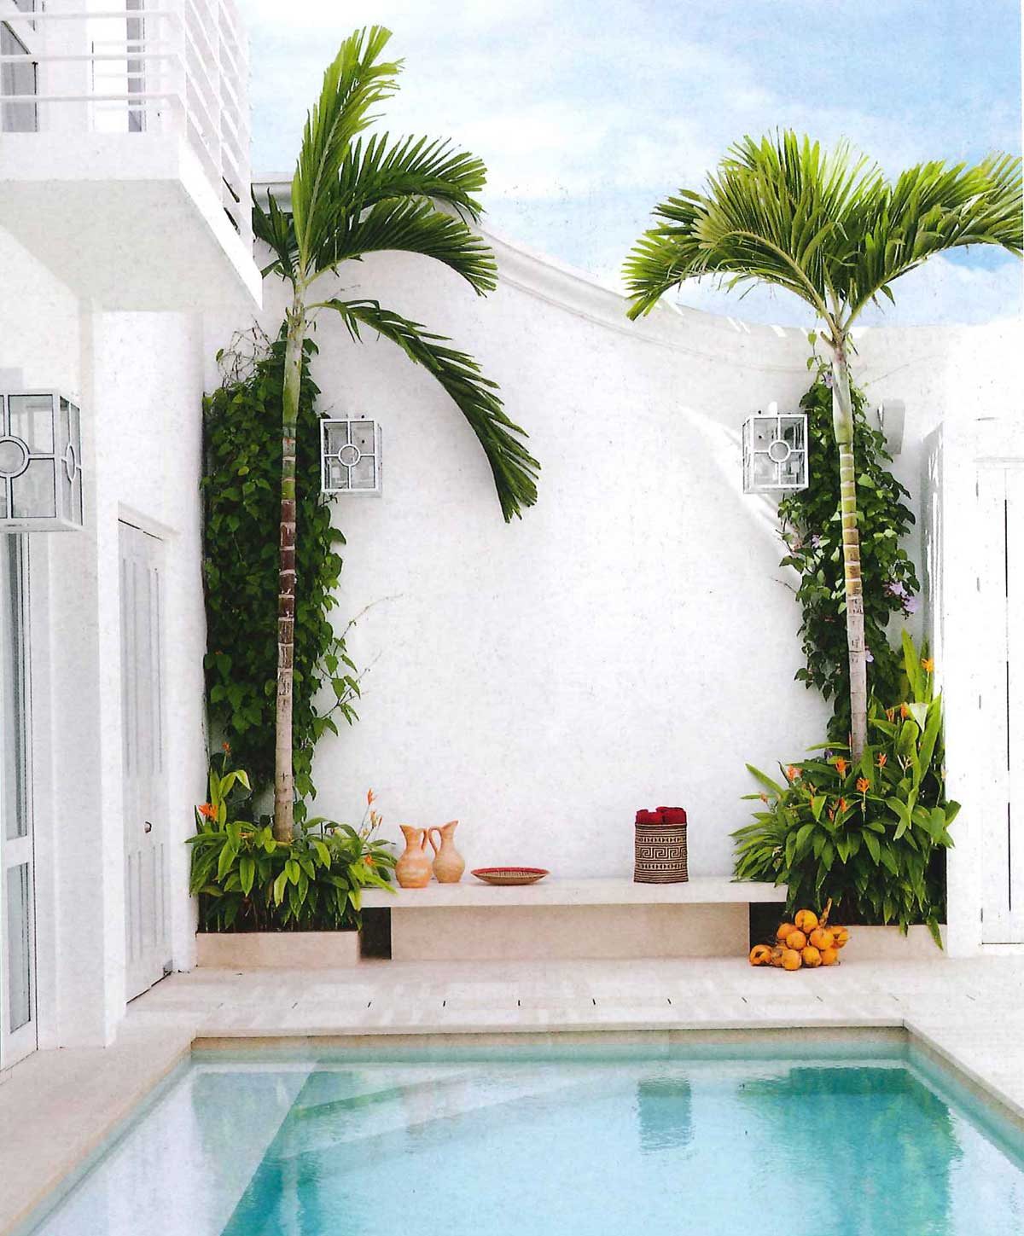 Modern swimming pool inspiration via @thouswellblog